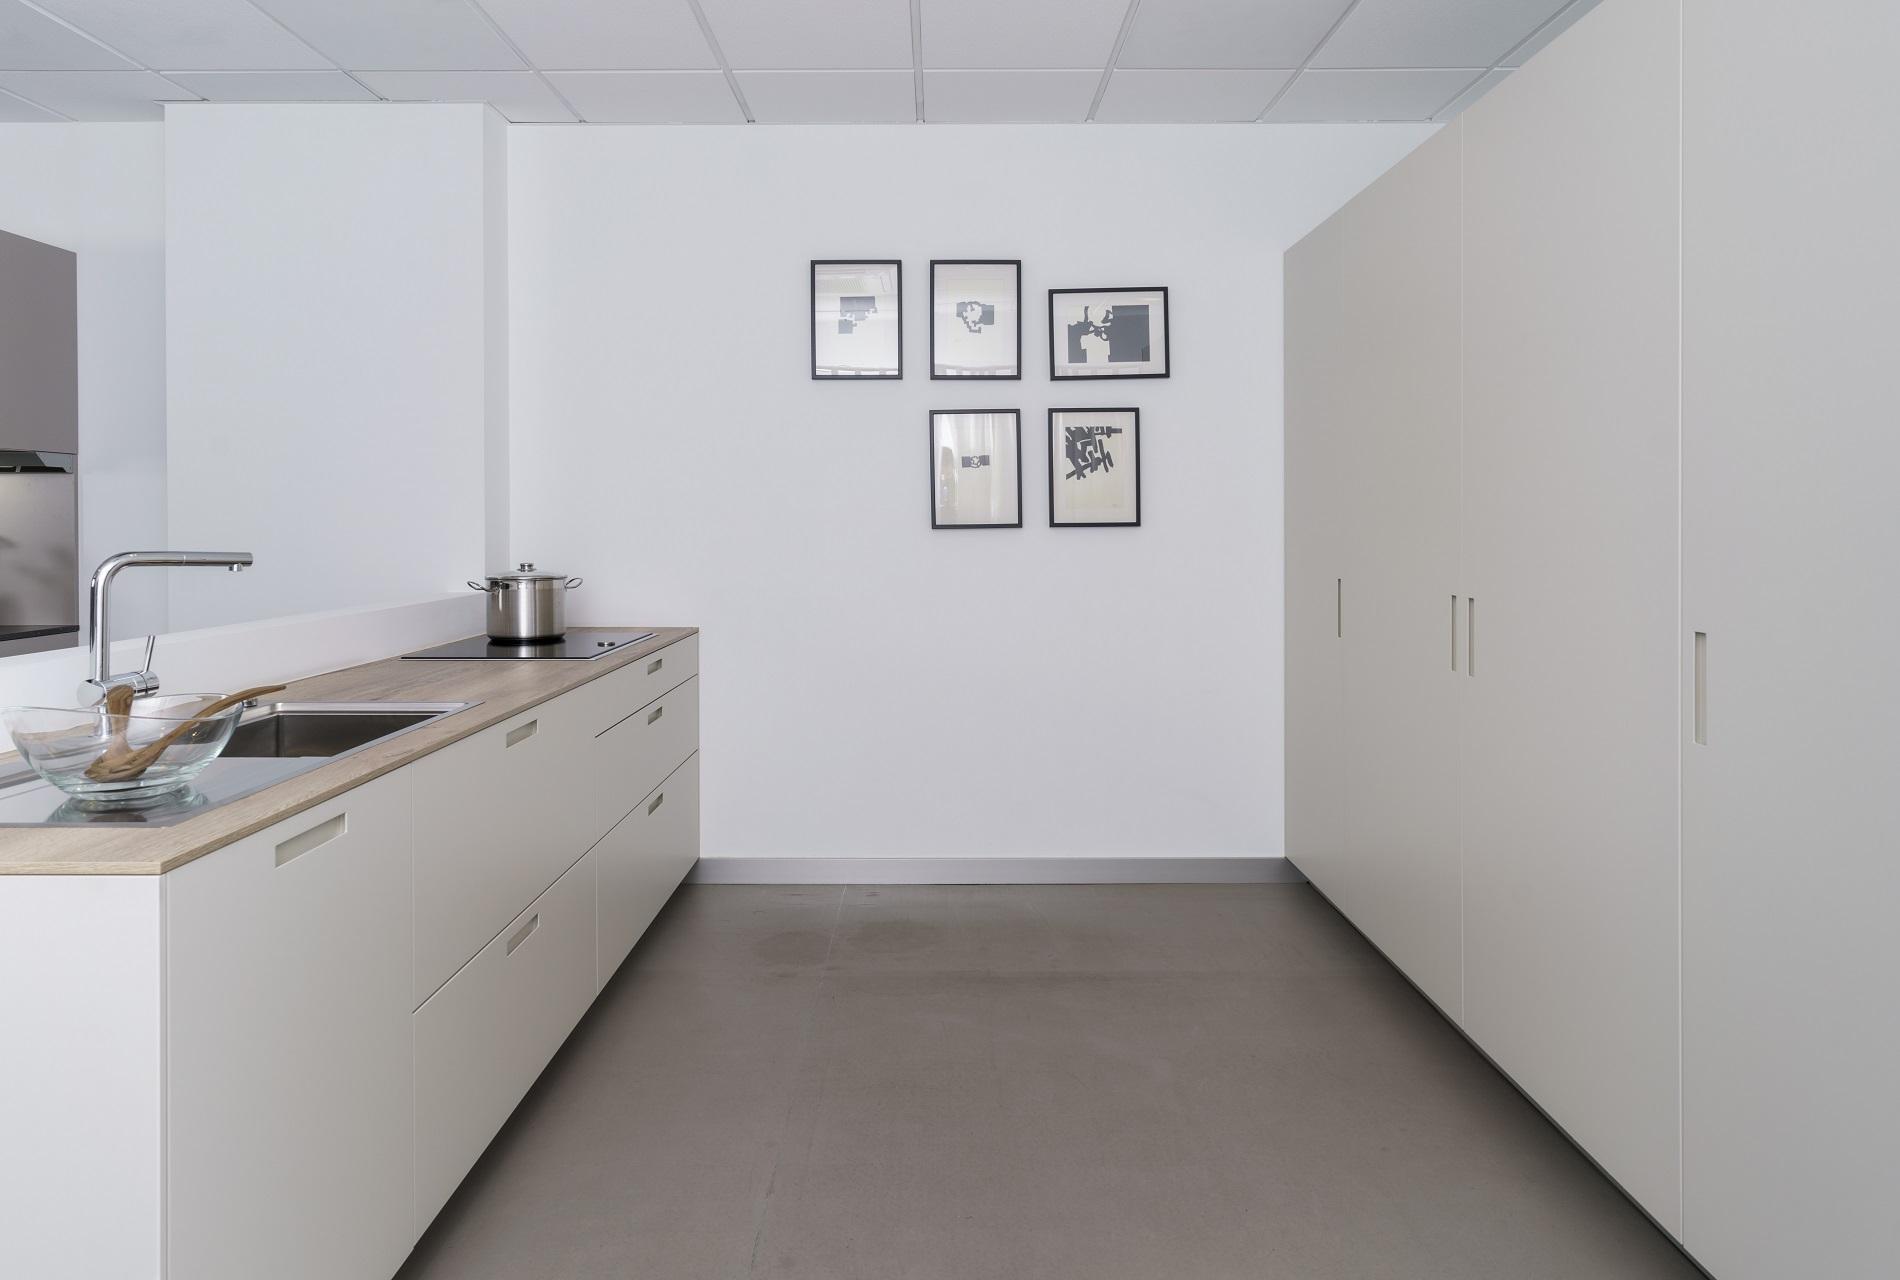 Image karmel-santiago-interiores-outlet